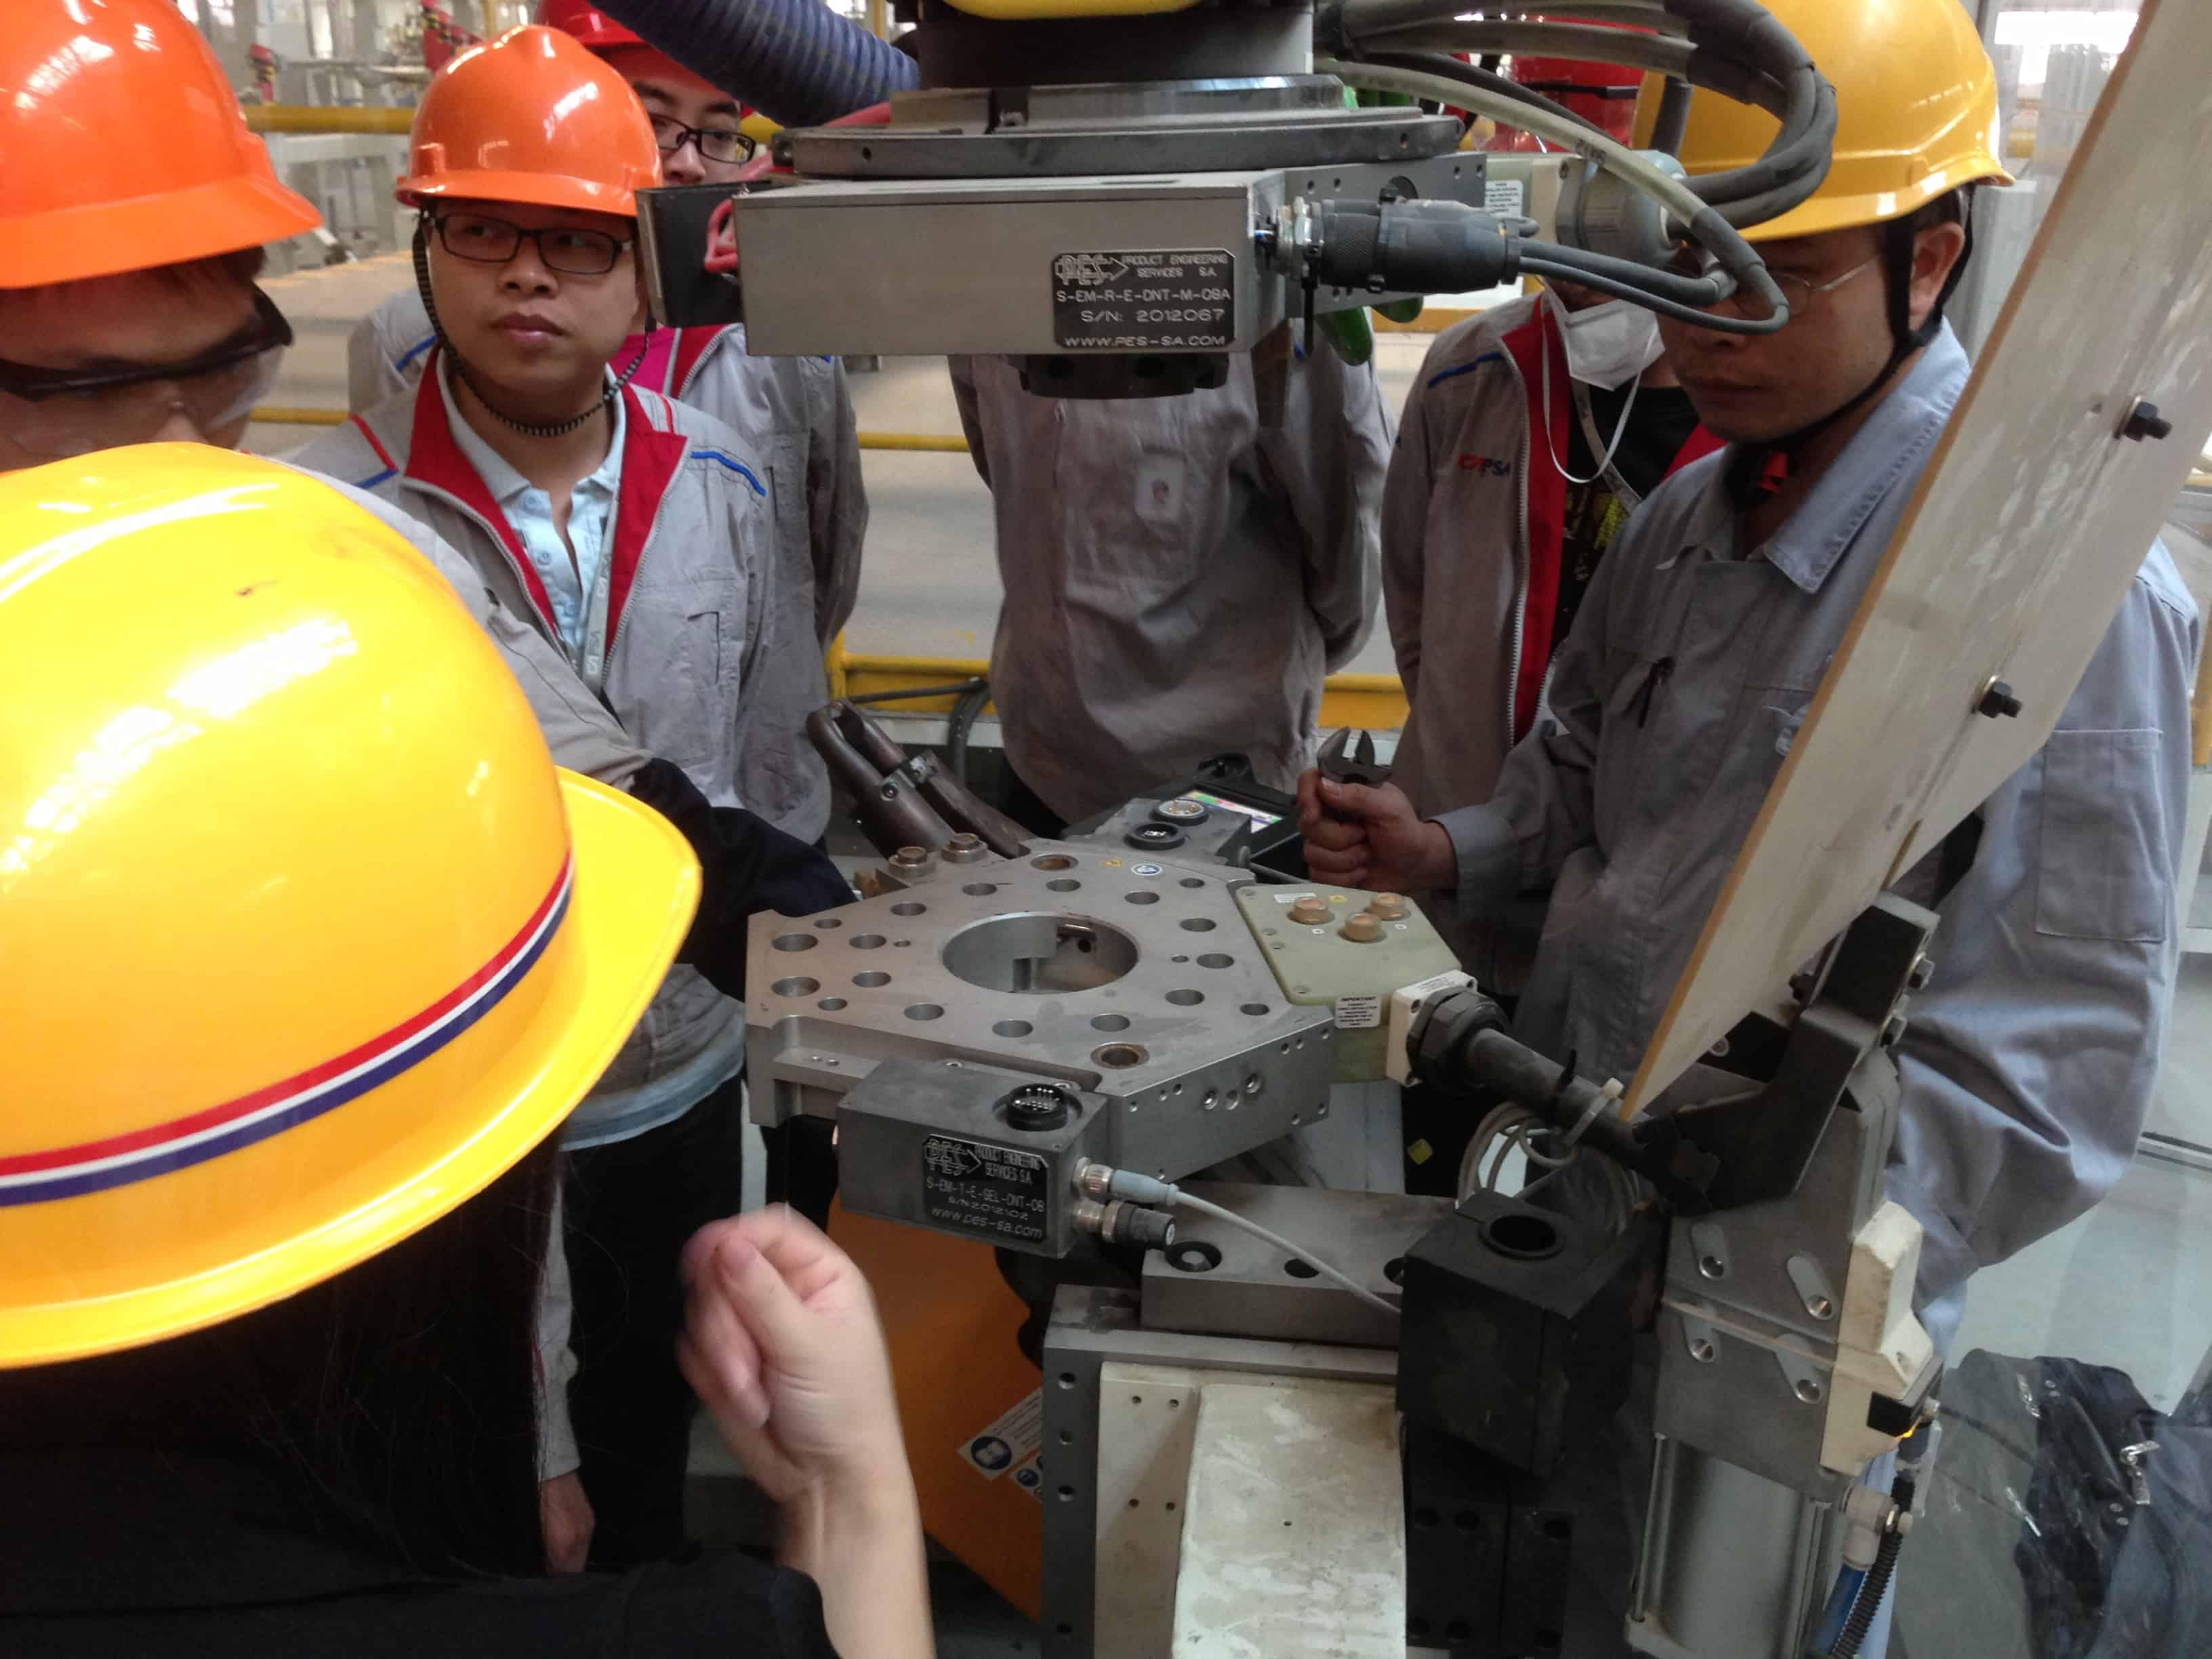 Robotic Product Testing